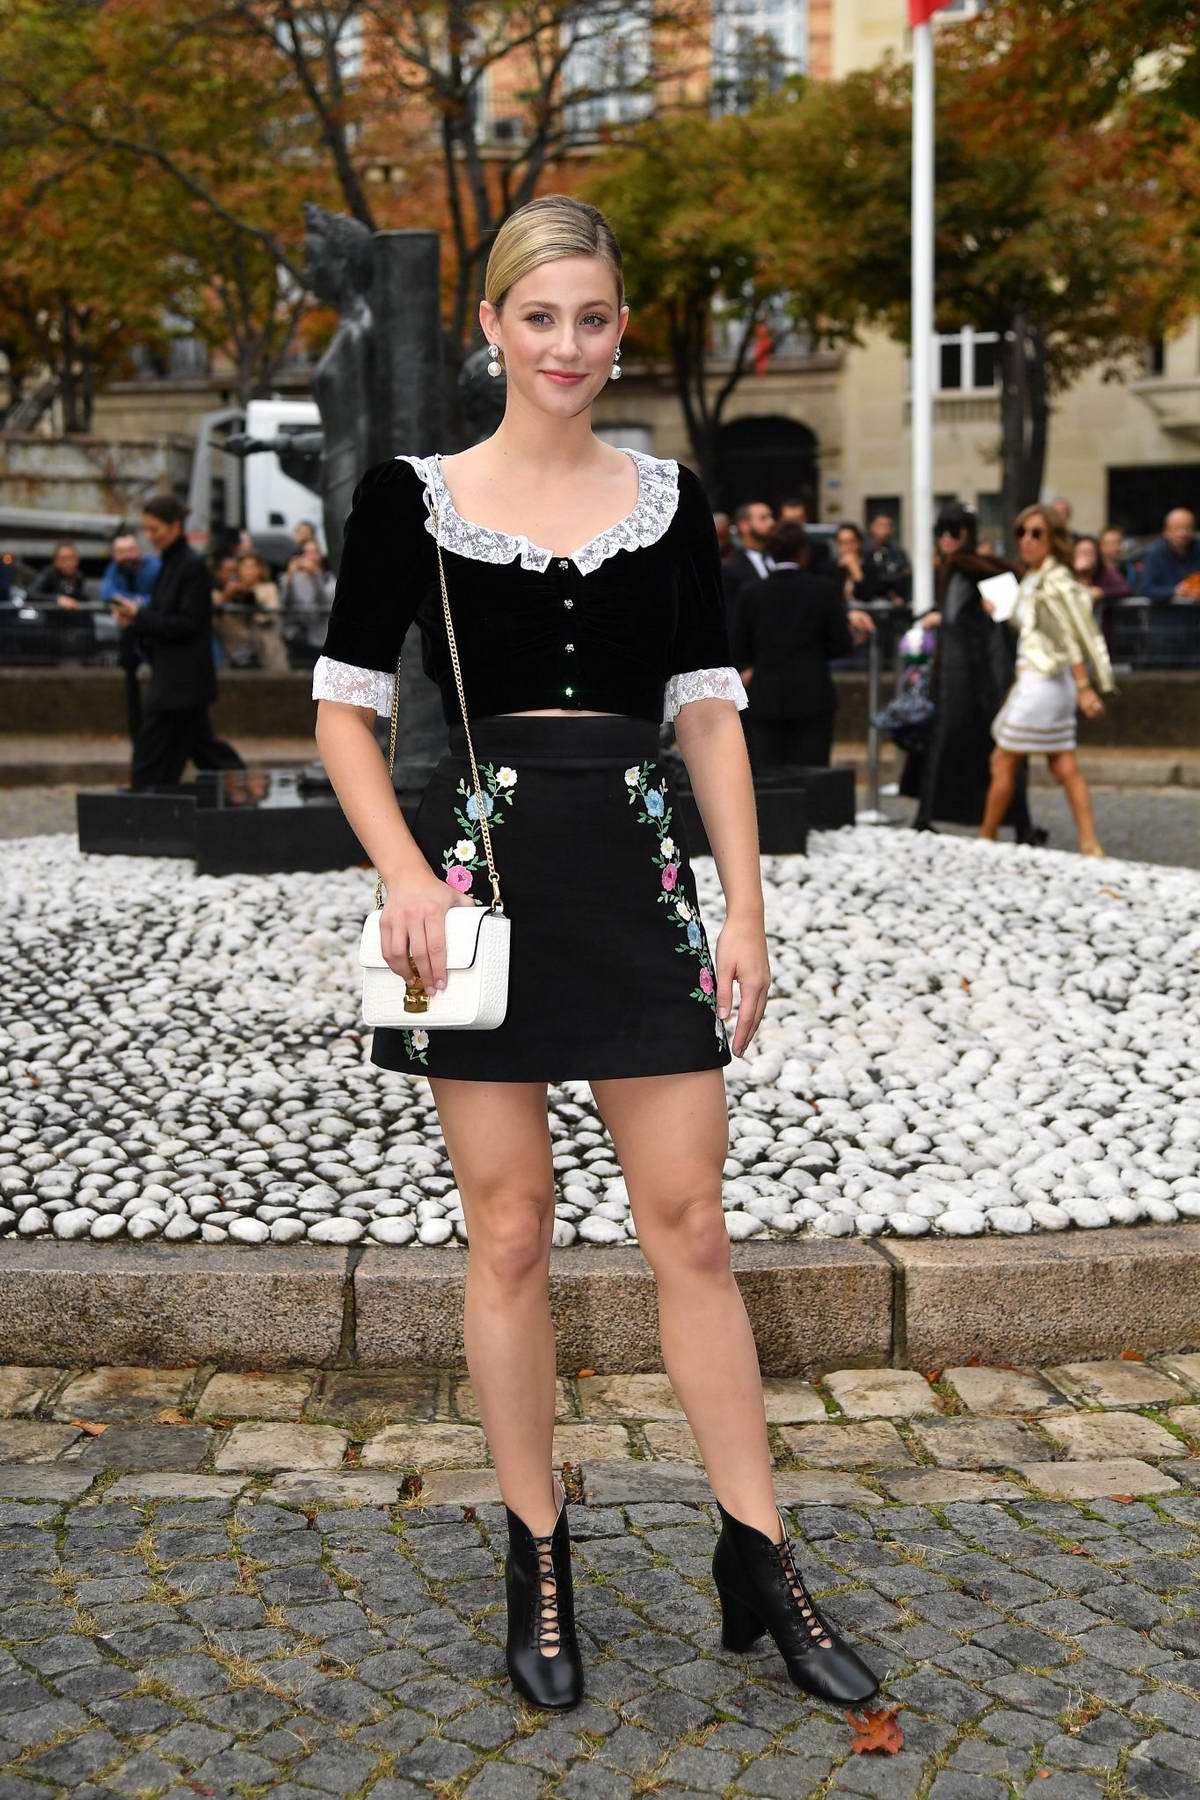 Lili Reinhart attends the Miu Miu Womenswear Spring/Summer 2020 show during Paris Fashion Week in Paris, France